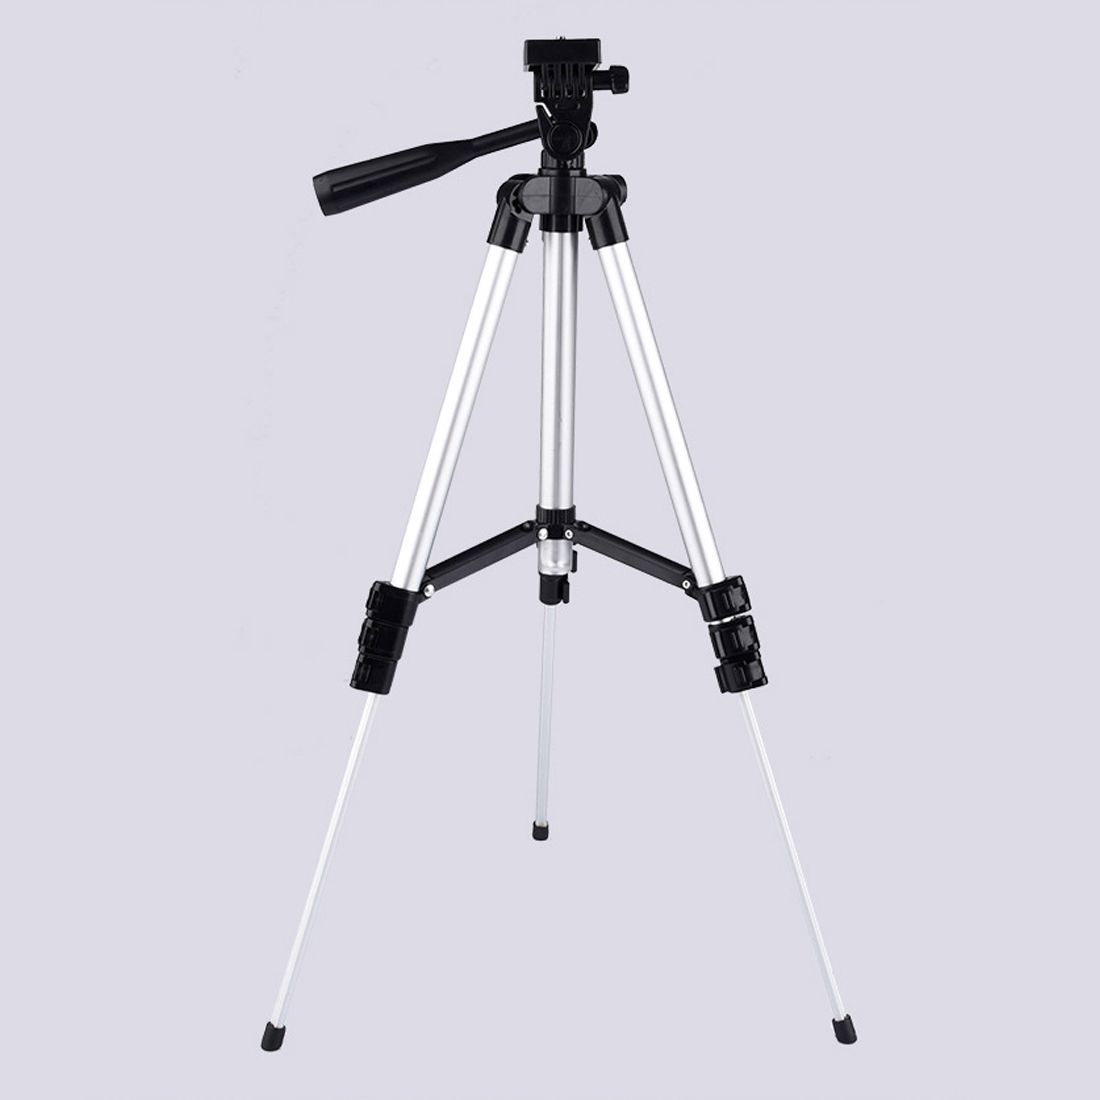 HONGDAK Brand New Professional High Quality Durable Camera Tripod Stand Holder Four Aluminum Tube Portable Tripod Carry Bag